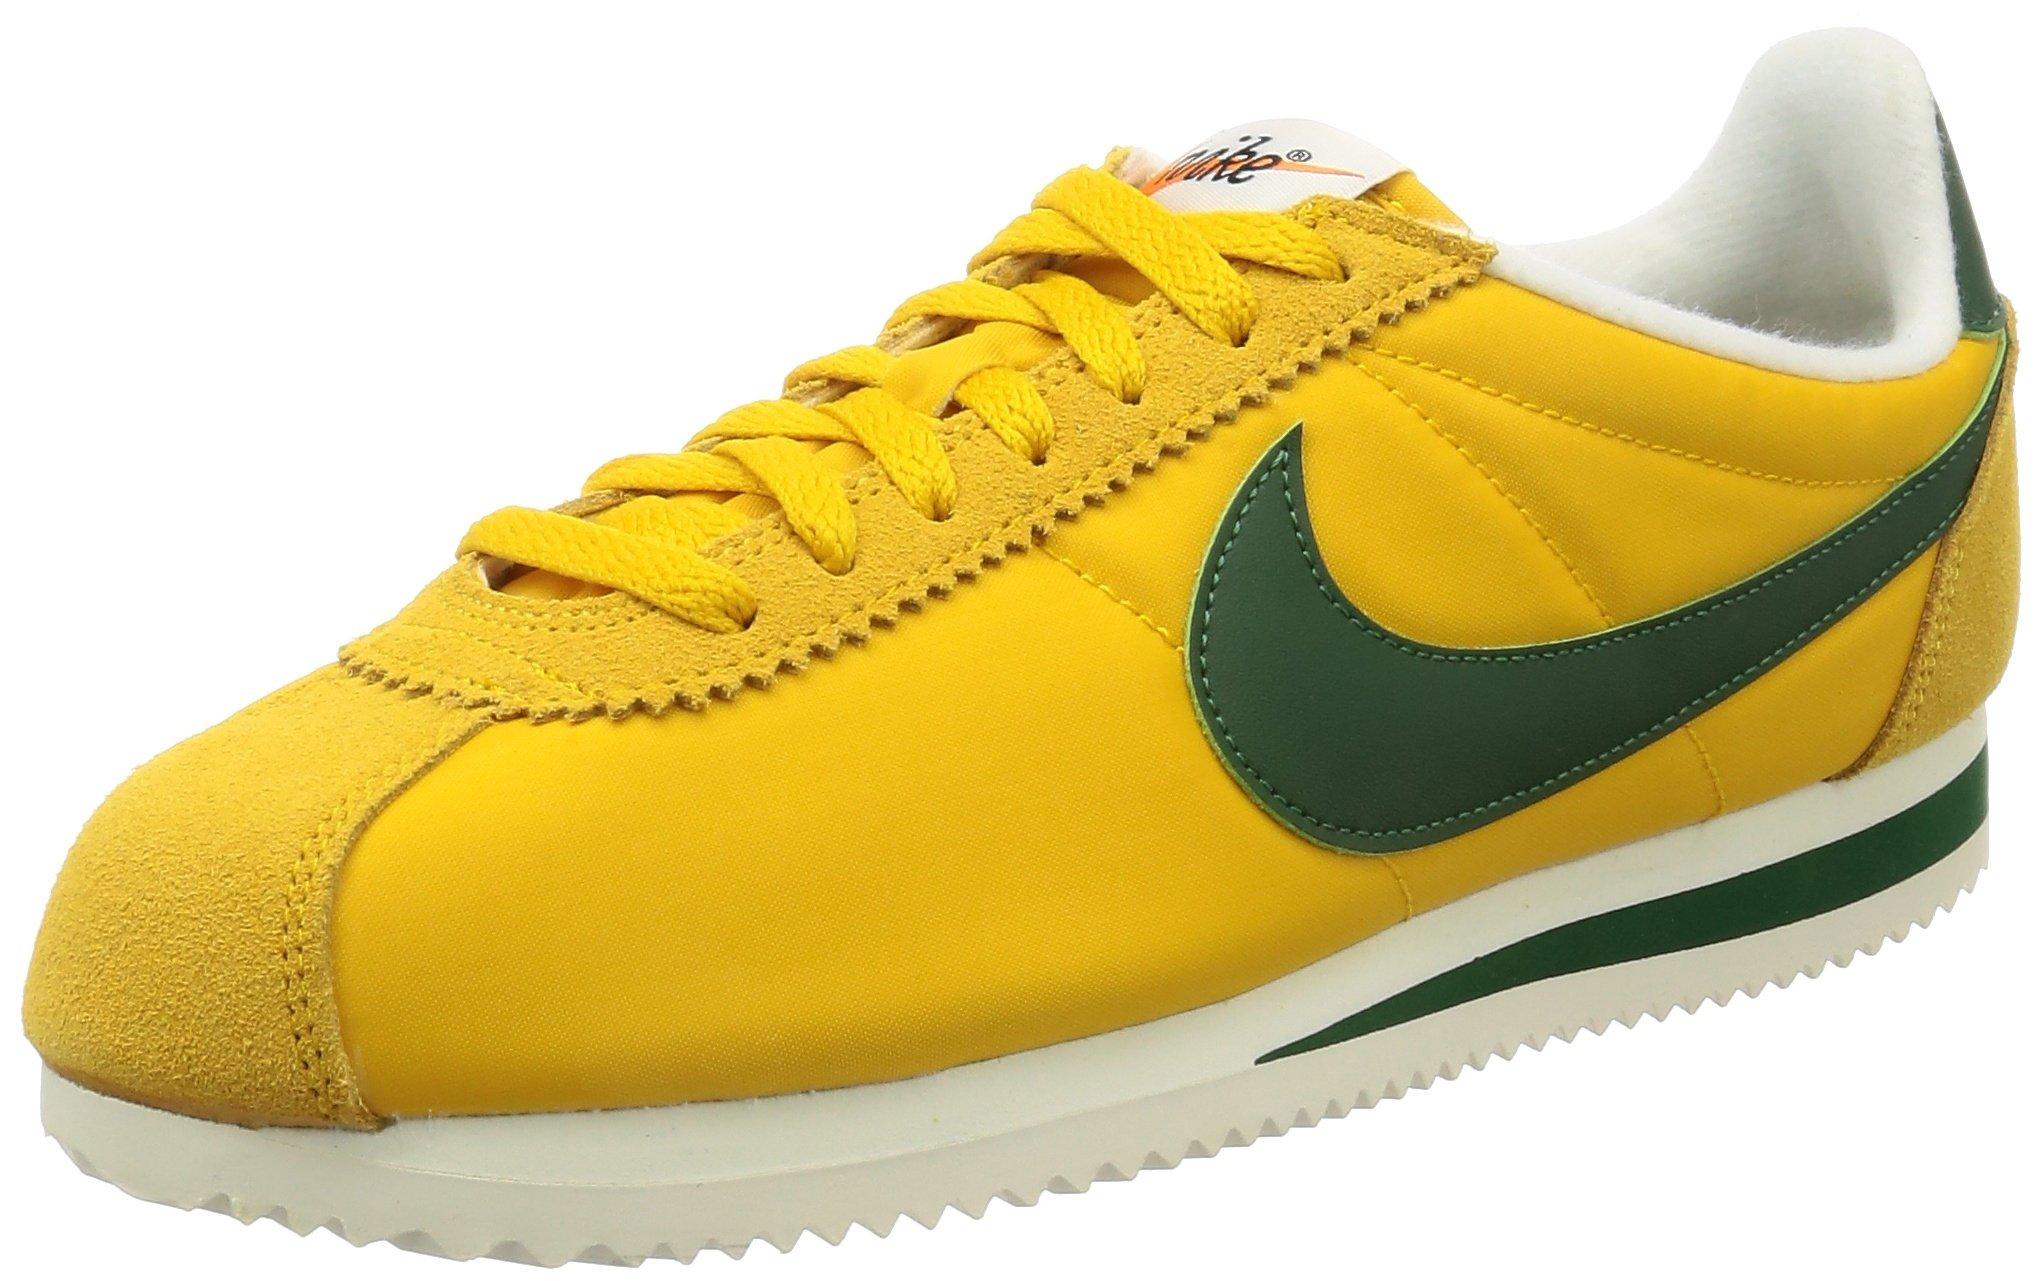 Nike Mens Classic Cortez Yellow Ochre